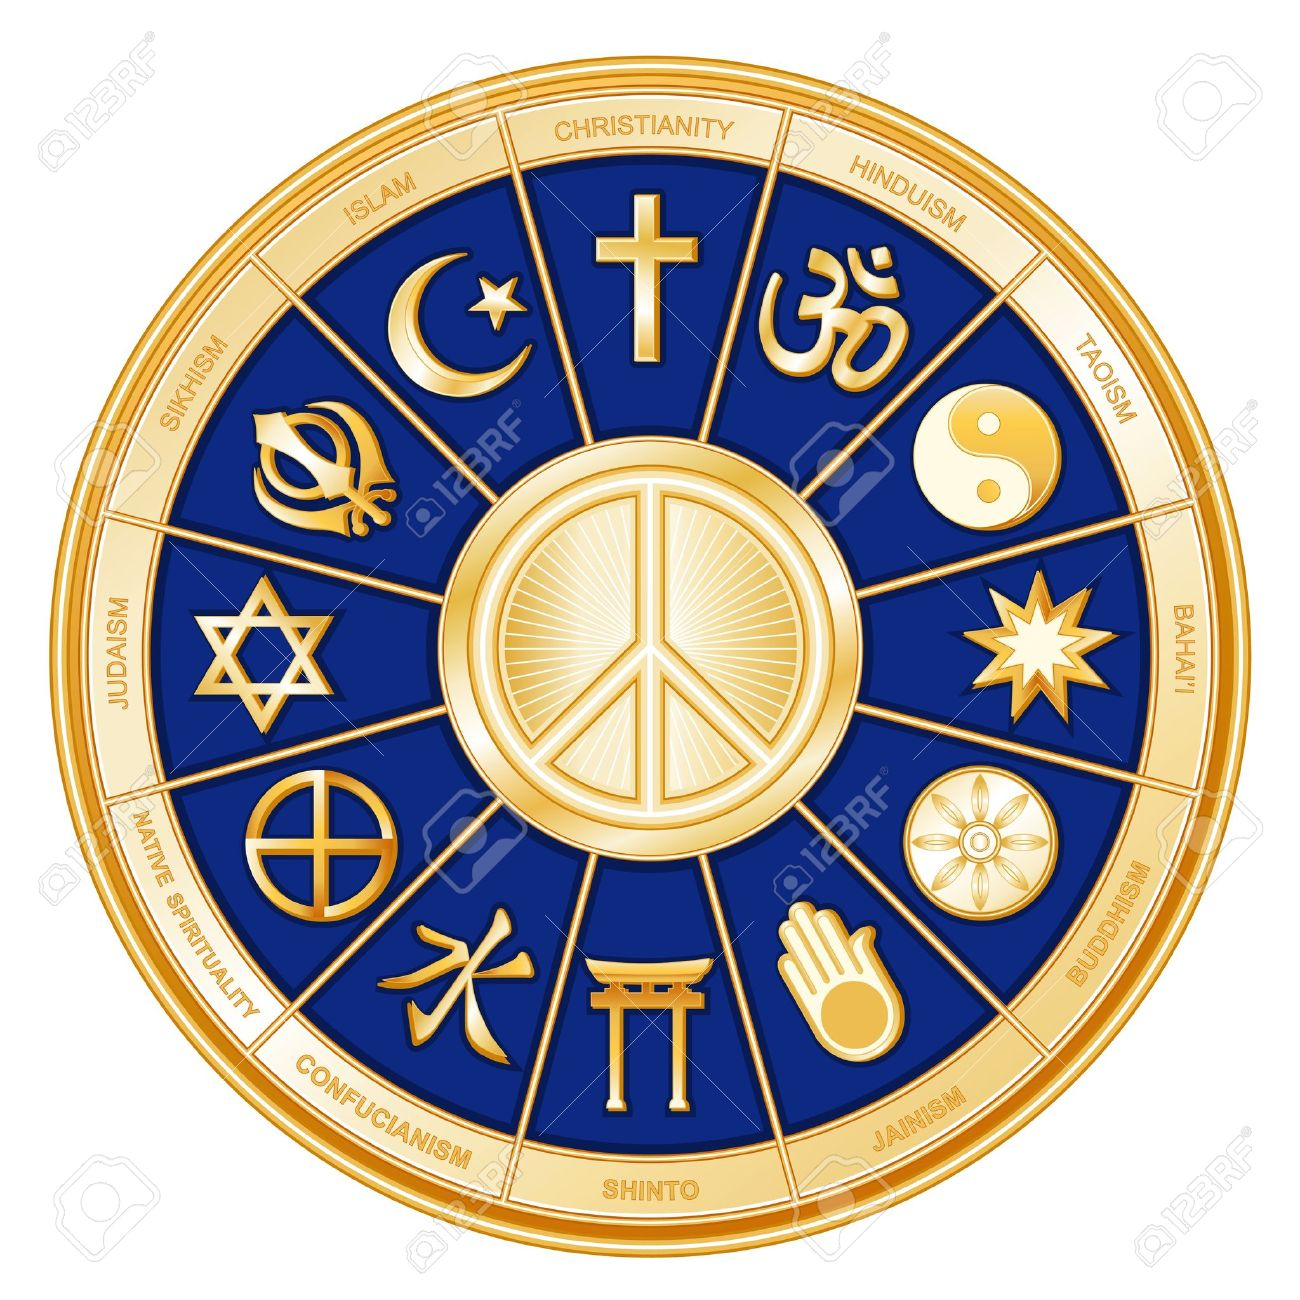 World Religions, International Peace Symbol  Islam, Christianity, Hinduism, Taoism, Baha i, Buddhism, Jain, Shinto, Confucianism, Native Spirituality, Judaism, Sikh, with labels Stock Vector - 14202159